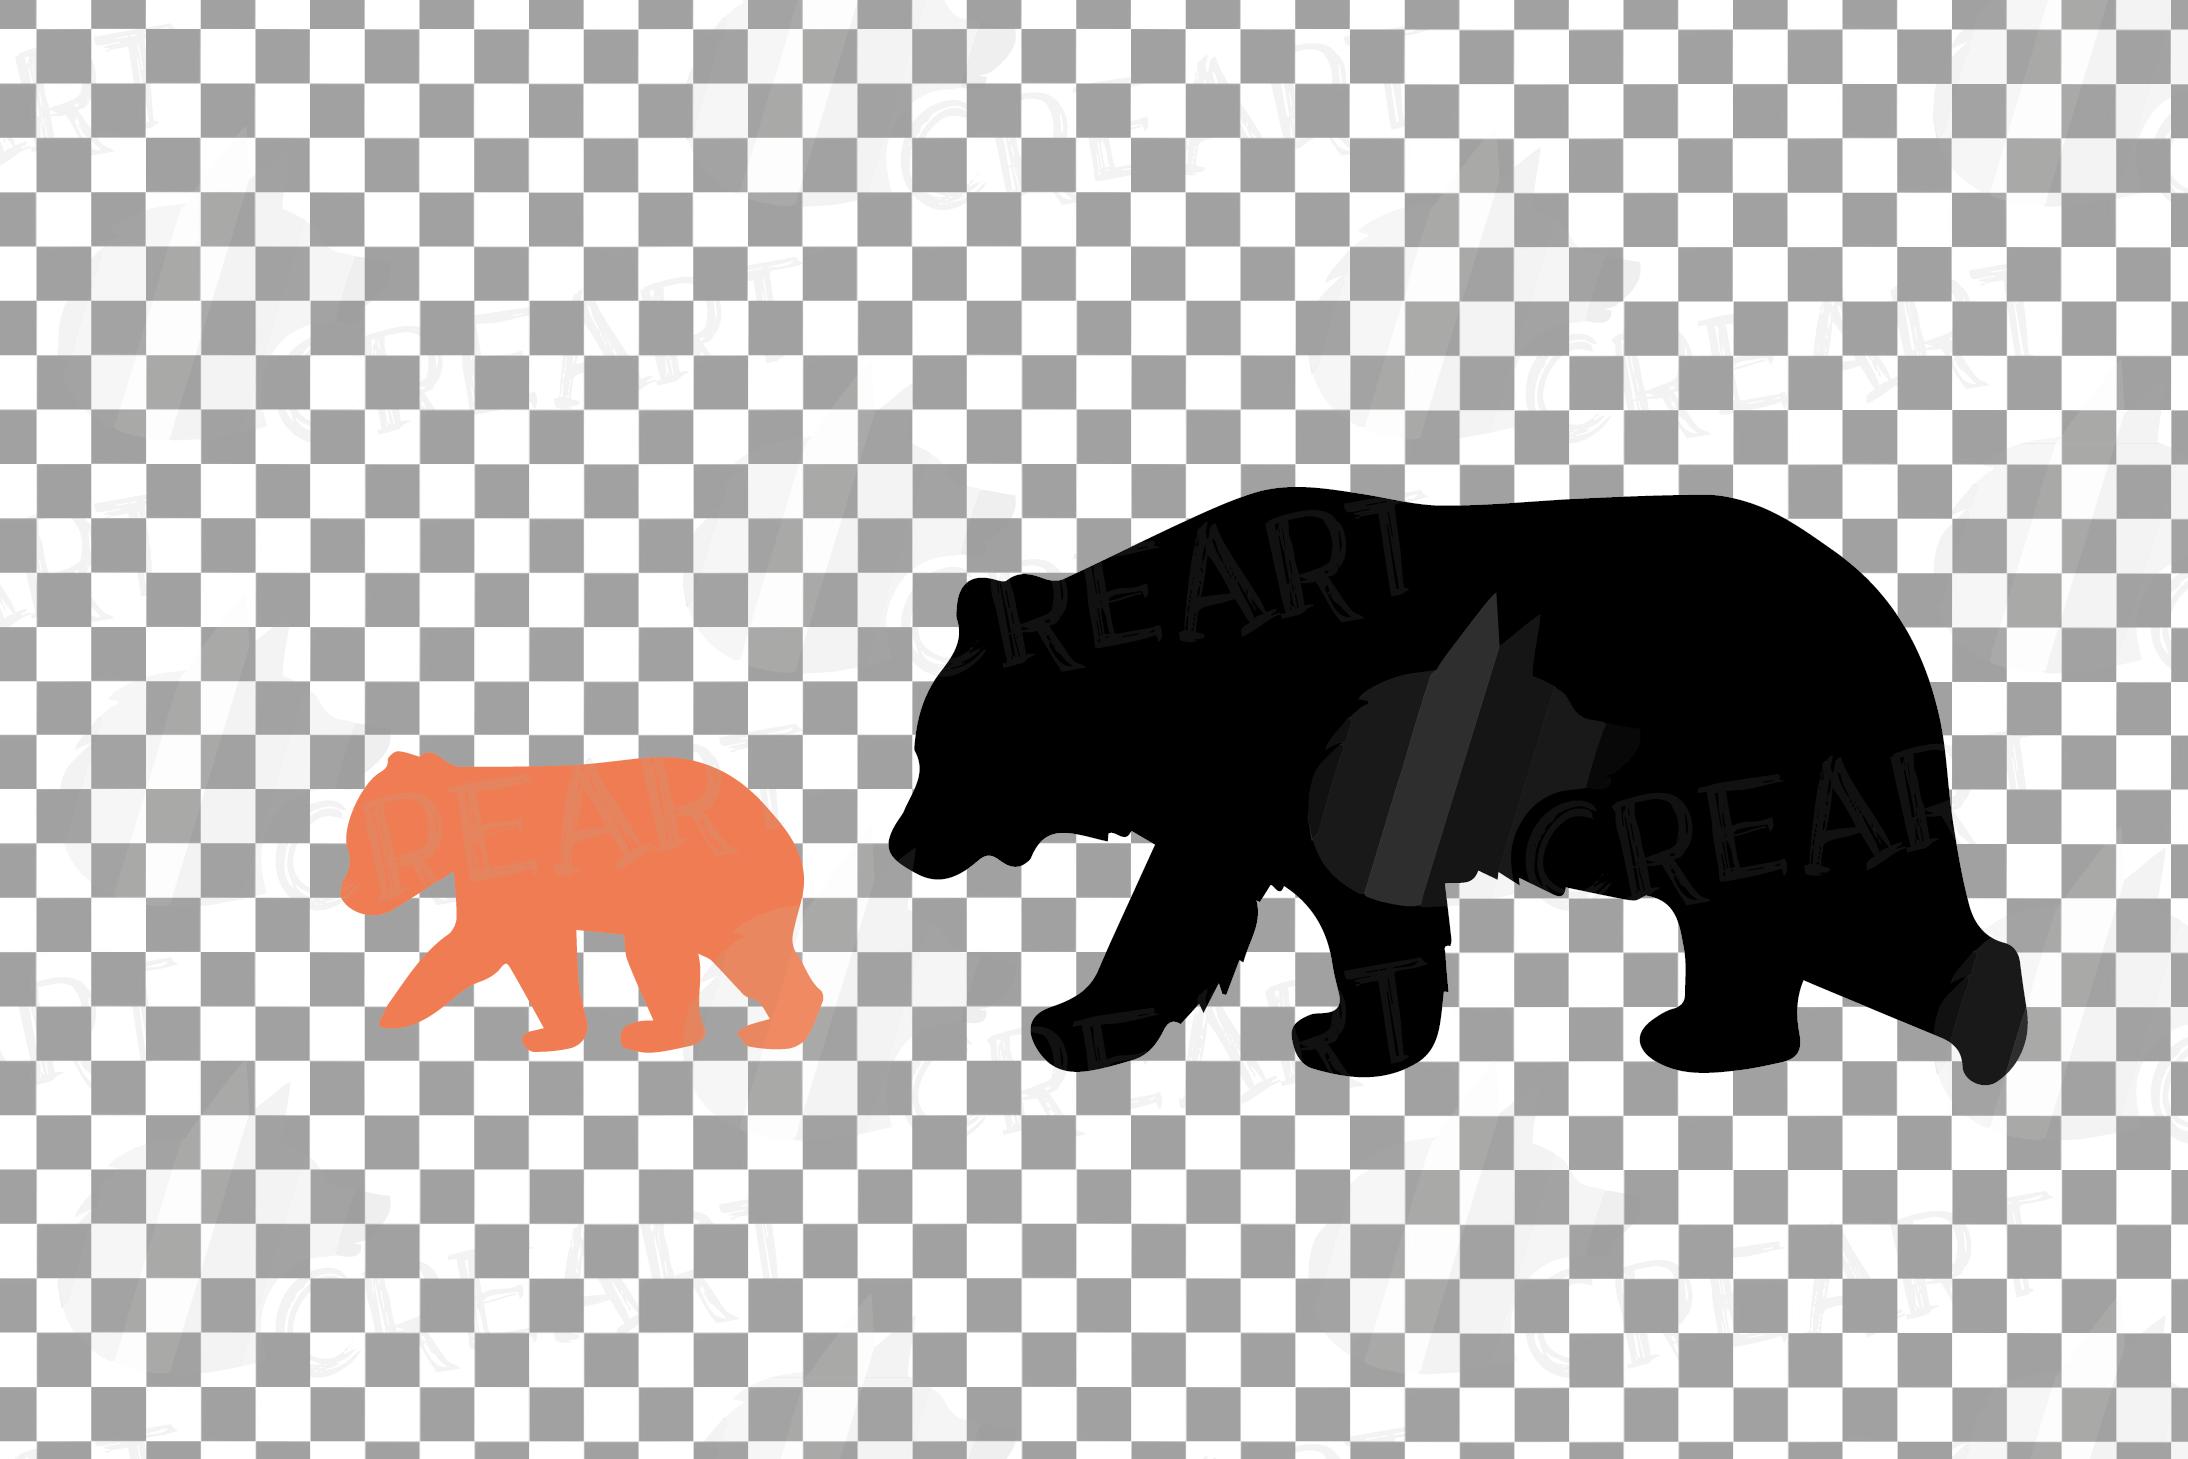 Baby and mama bear nursery clip art collection, bears print example image 16